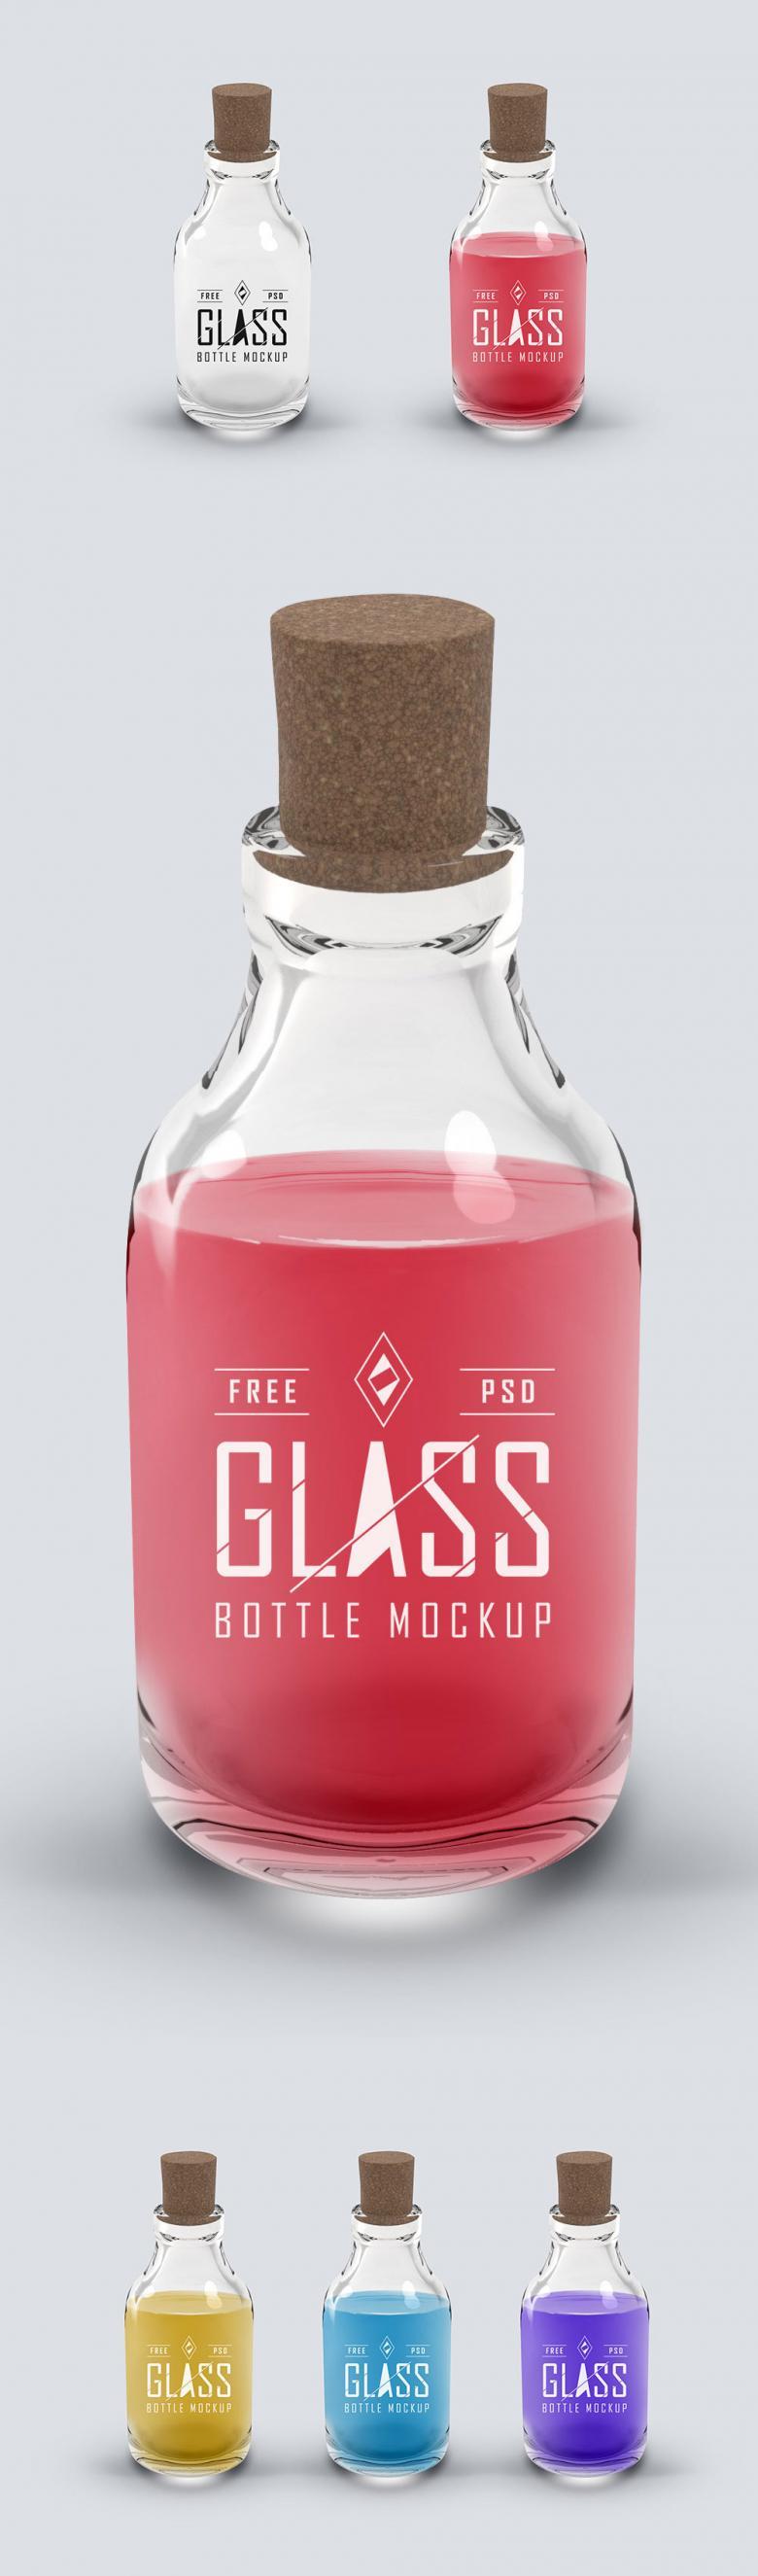 Glass Bottle Psd Mockup The Creative Feed Bottle Glass Bottles Bottle Mockup